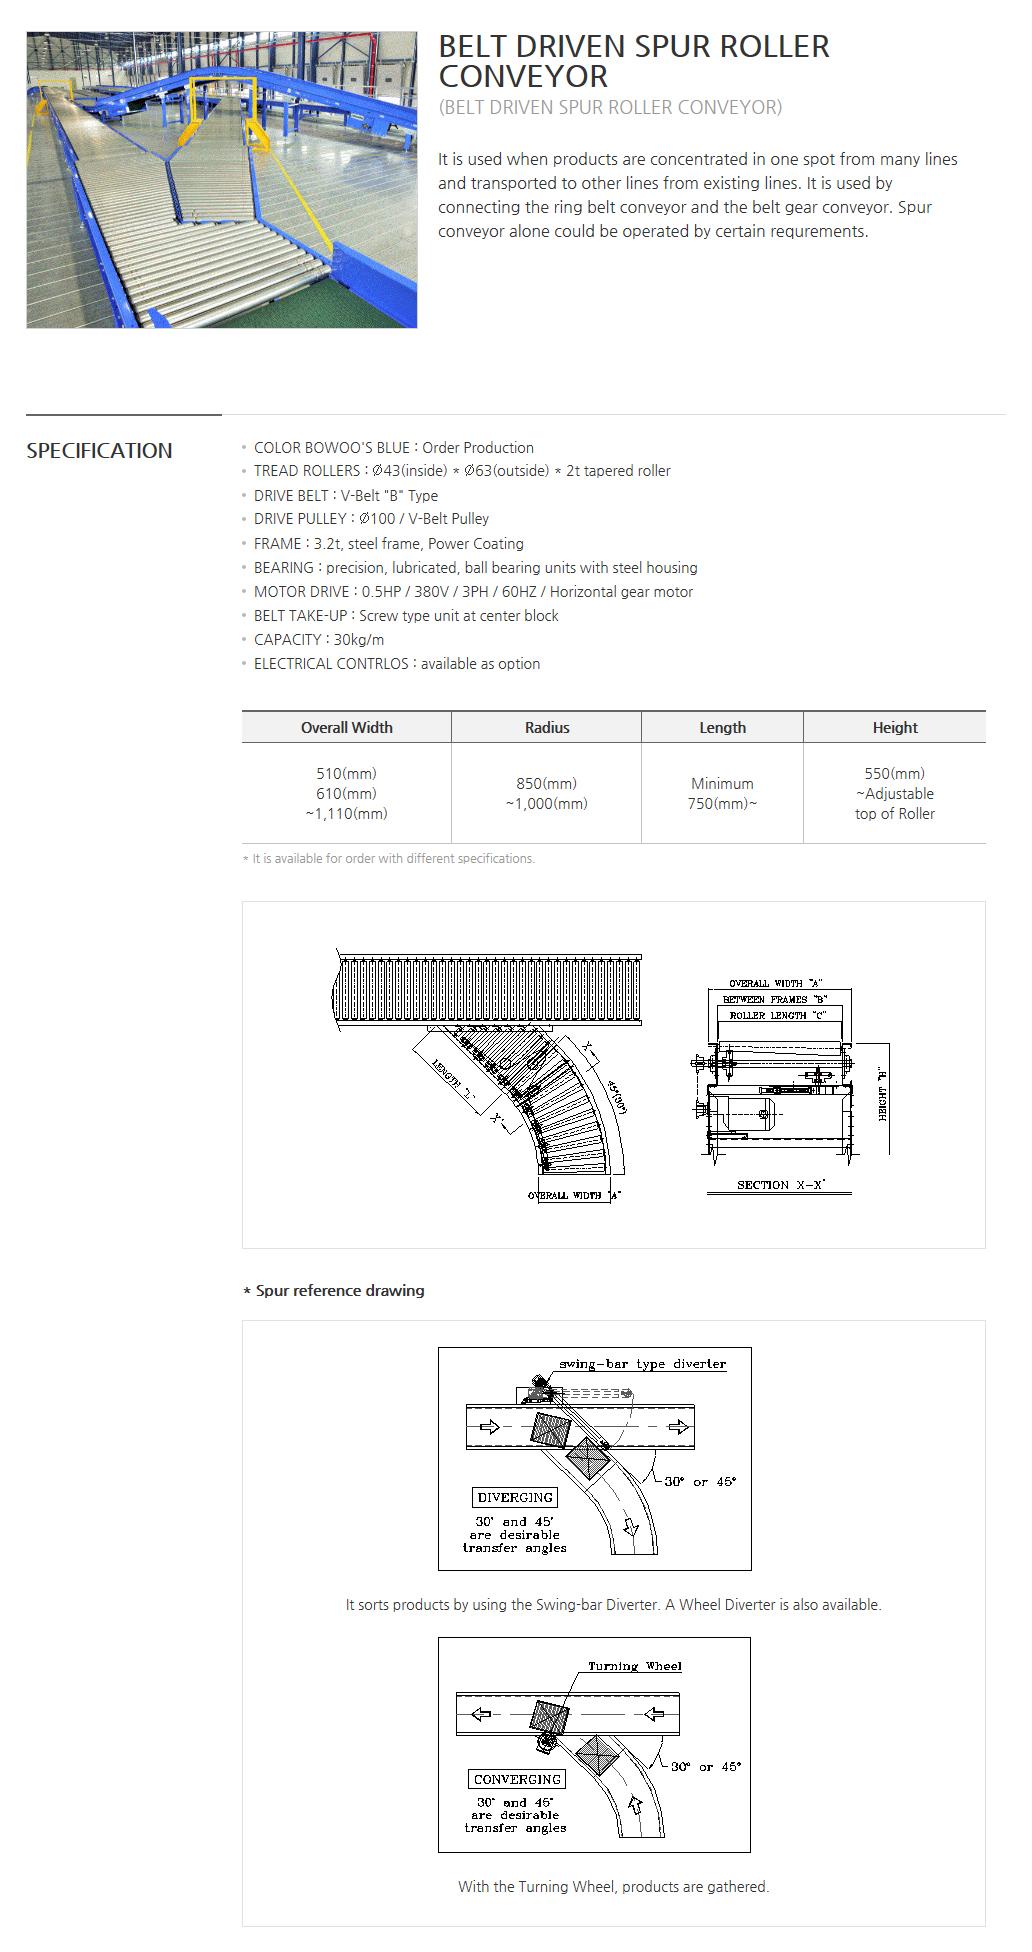 BOWOOSYSTEM Power Conveyor : Belt Driven Spur Roller Conveyor